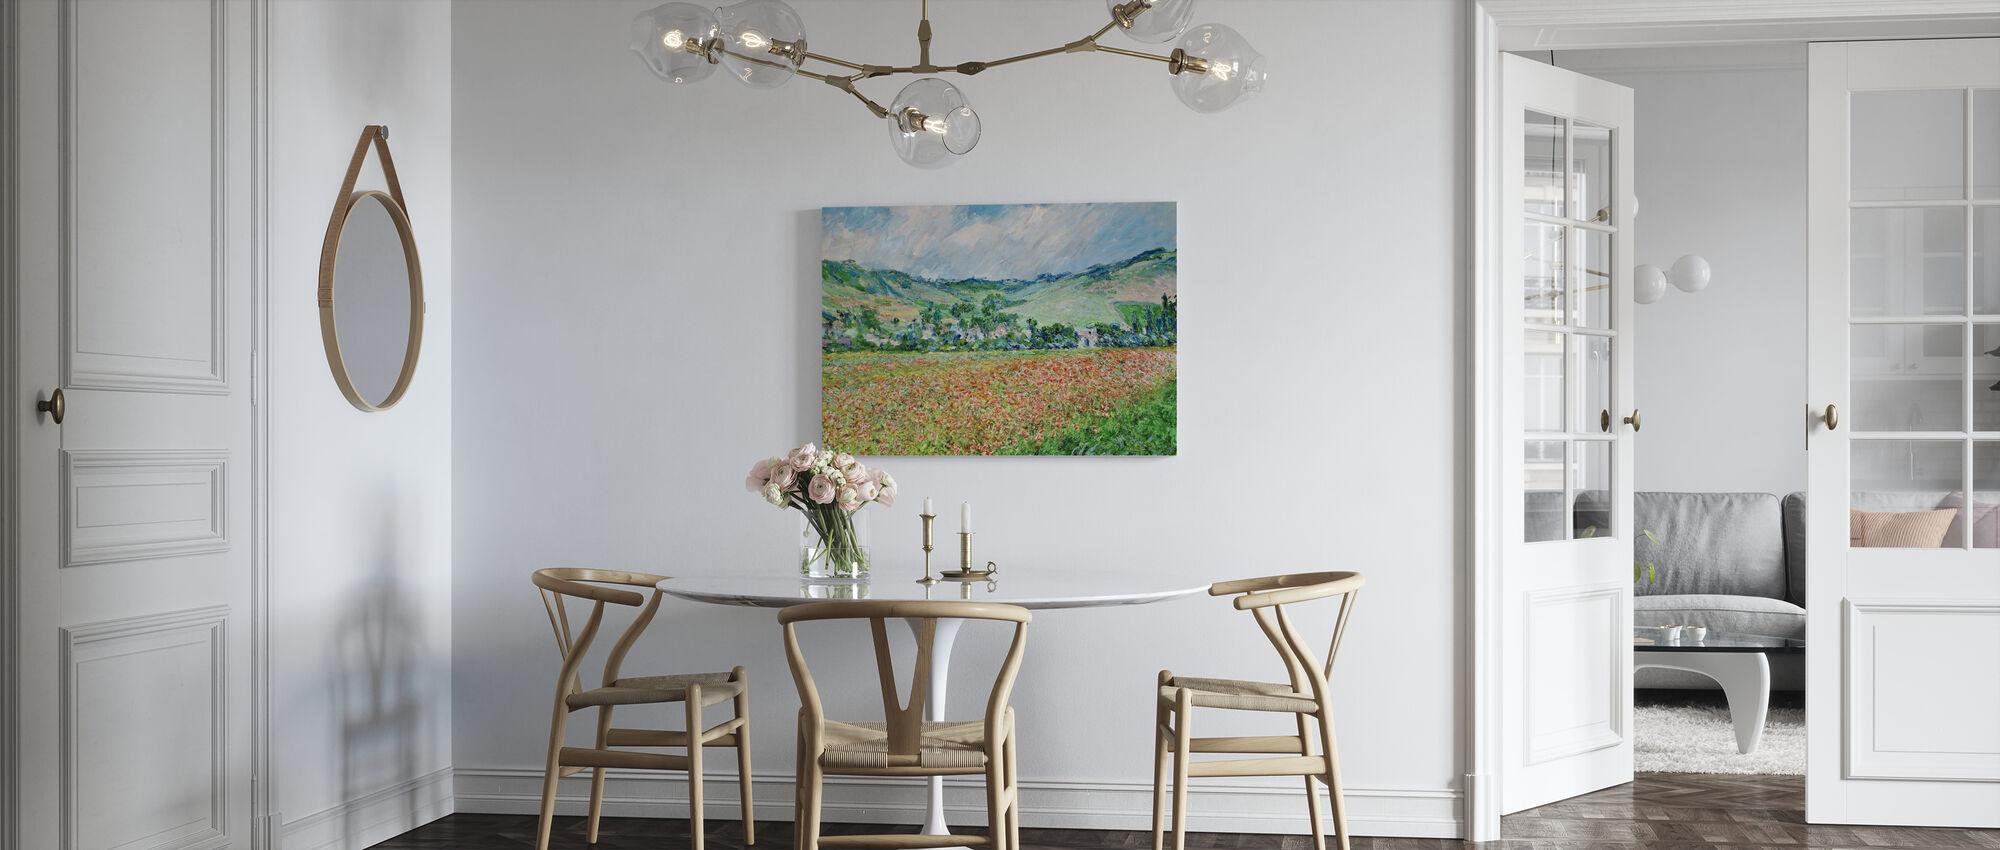 Poppies - Vincent Van Gogh - Canvas print - Kitchen